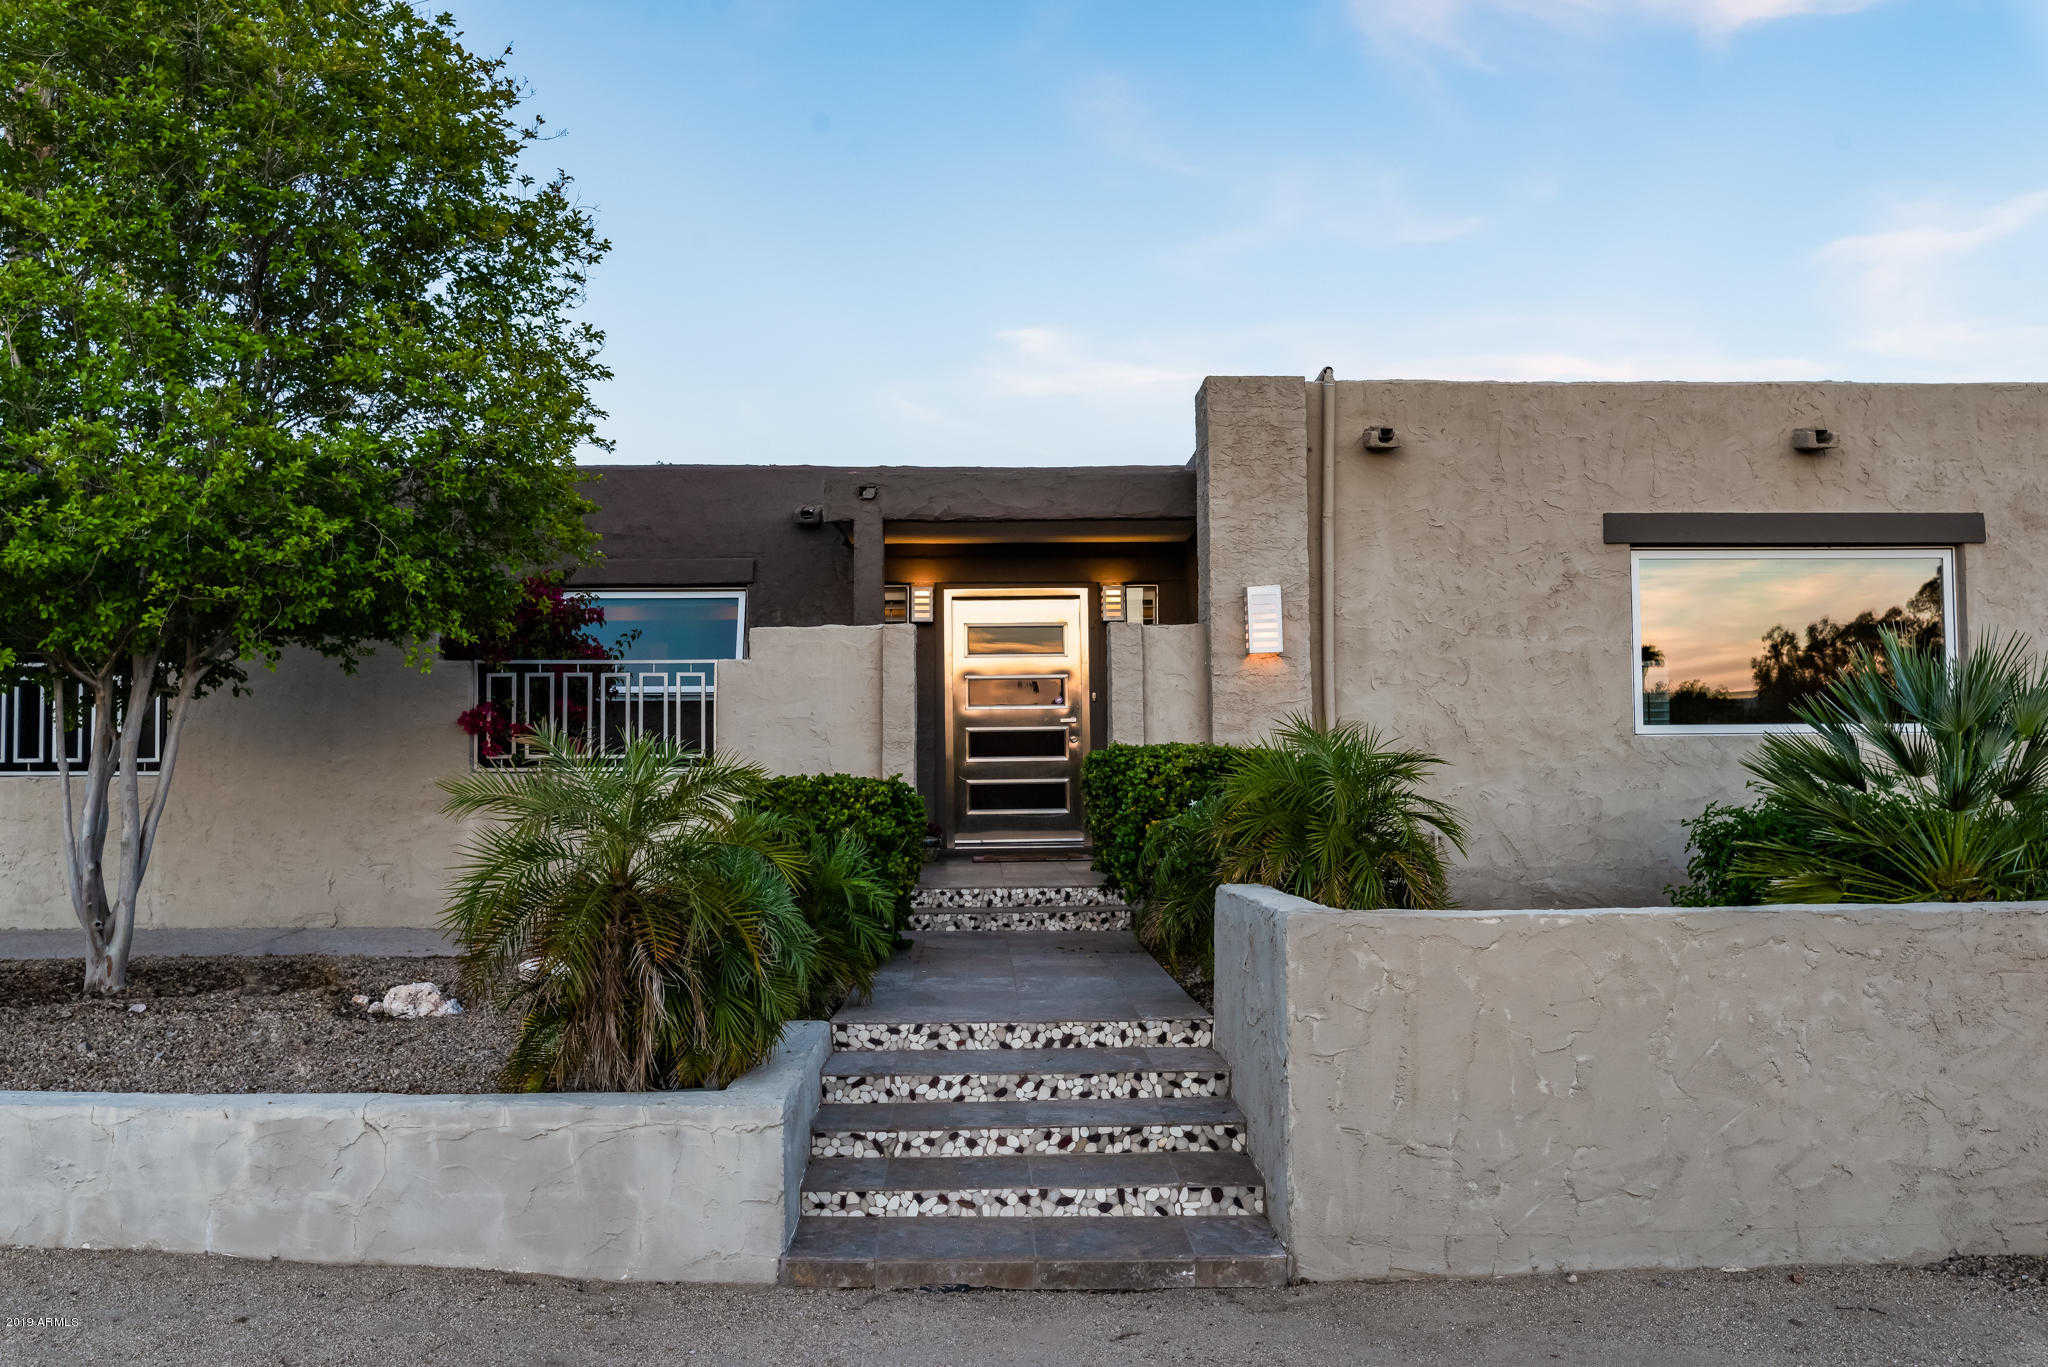 $1,100,000 - 4Br/4Ba - Home for Sale in Palo Verde Foothills Estates, Paradise Valley